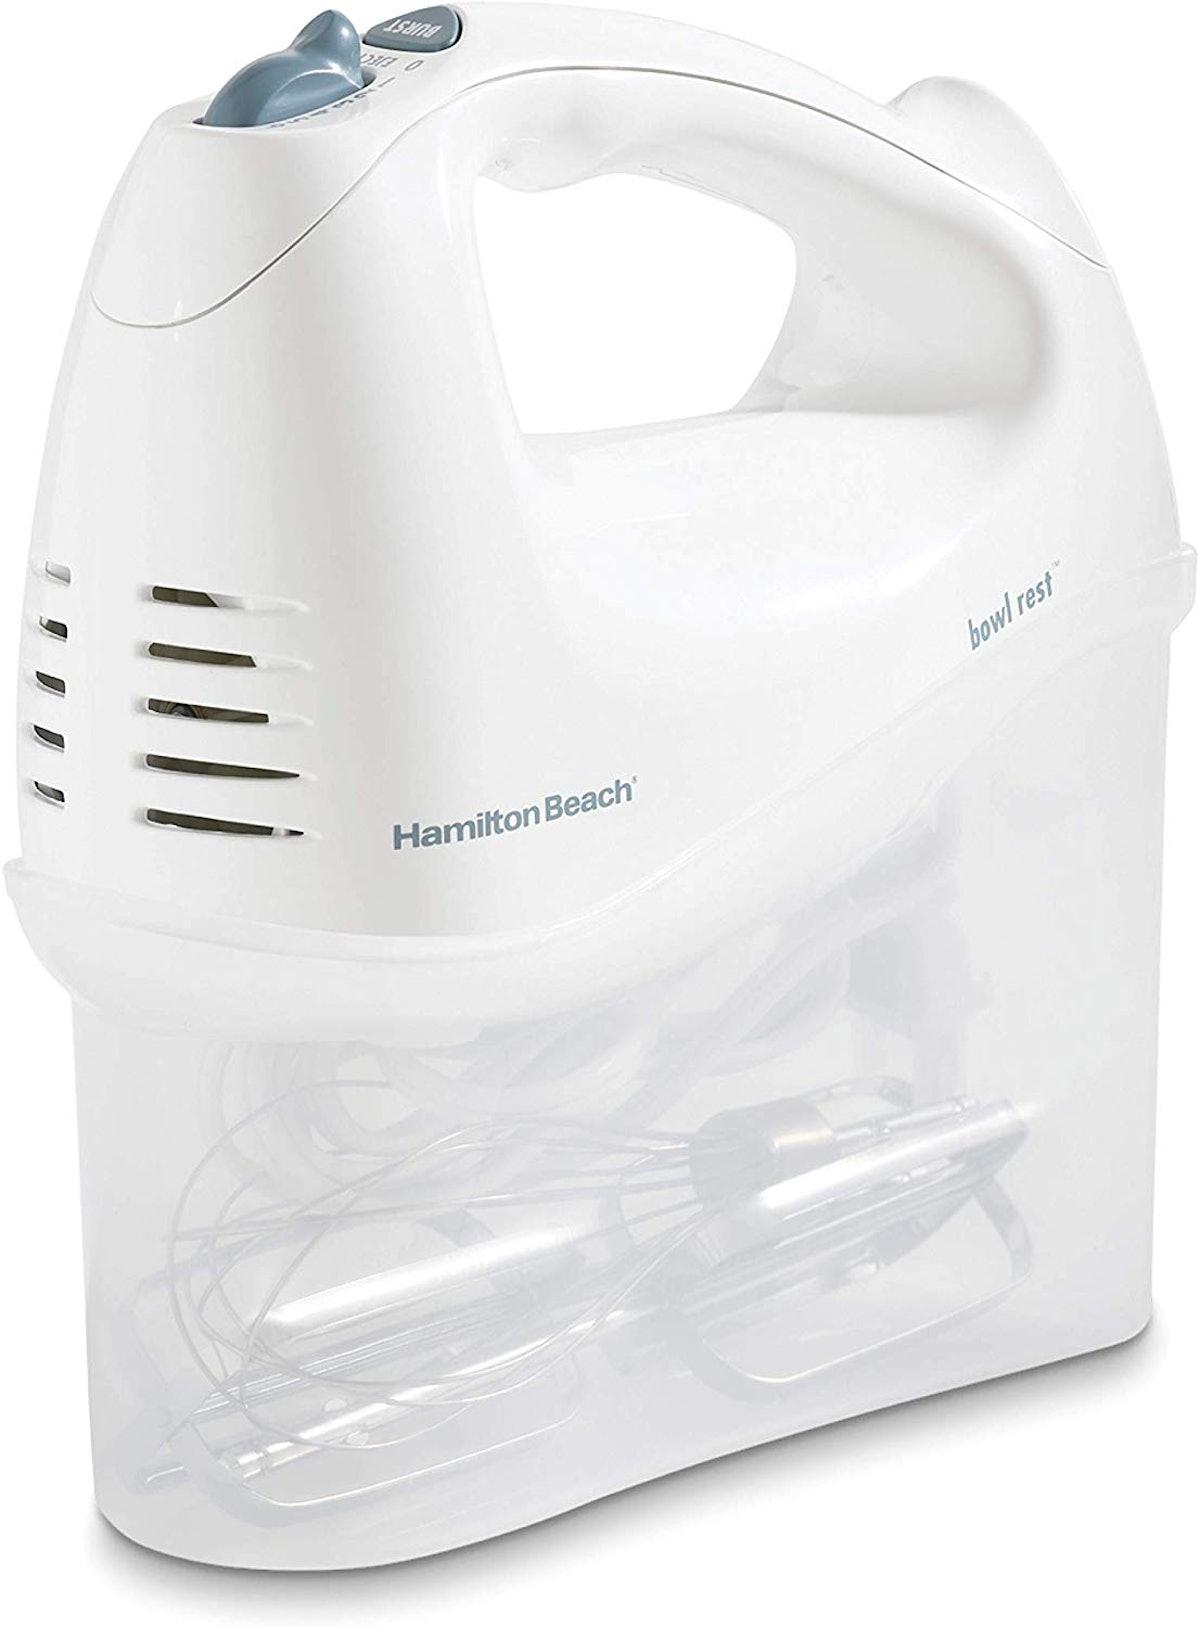 Hamilton Beach Electric Hand Mixer with Storage Case